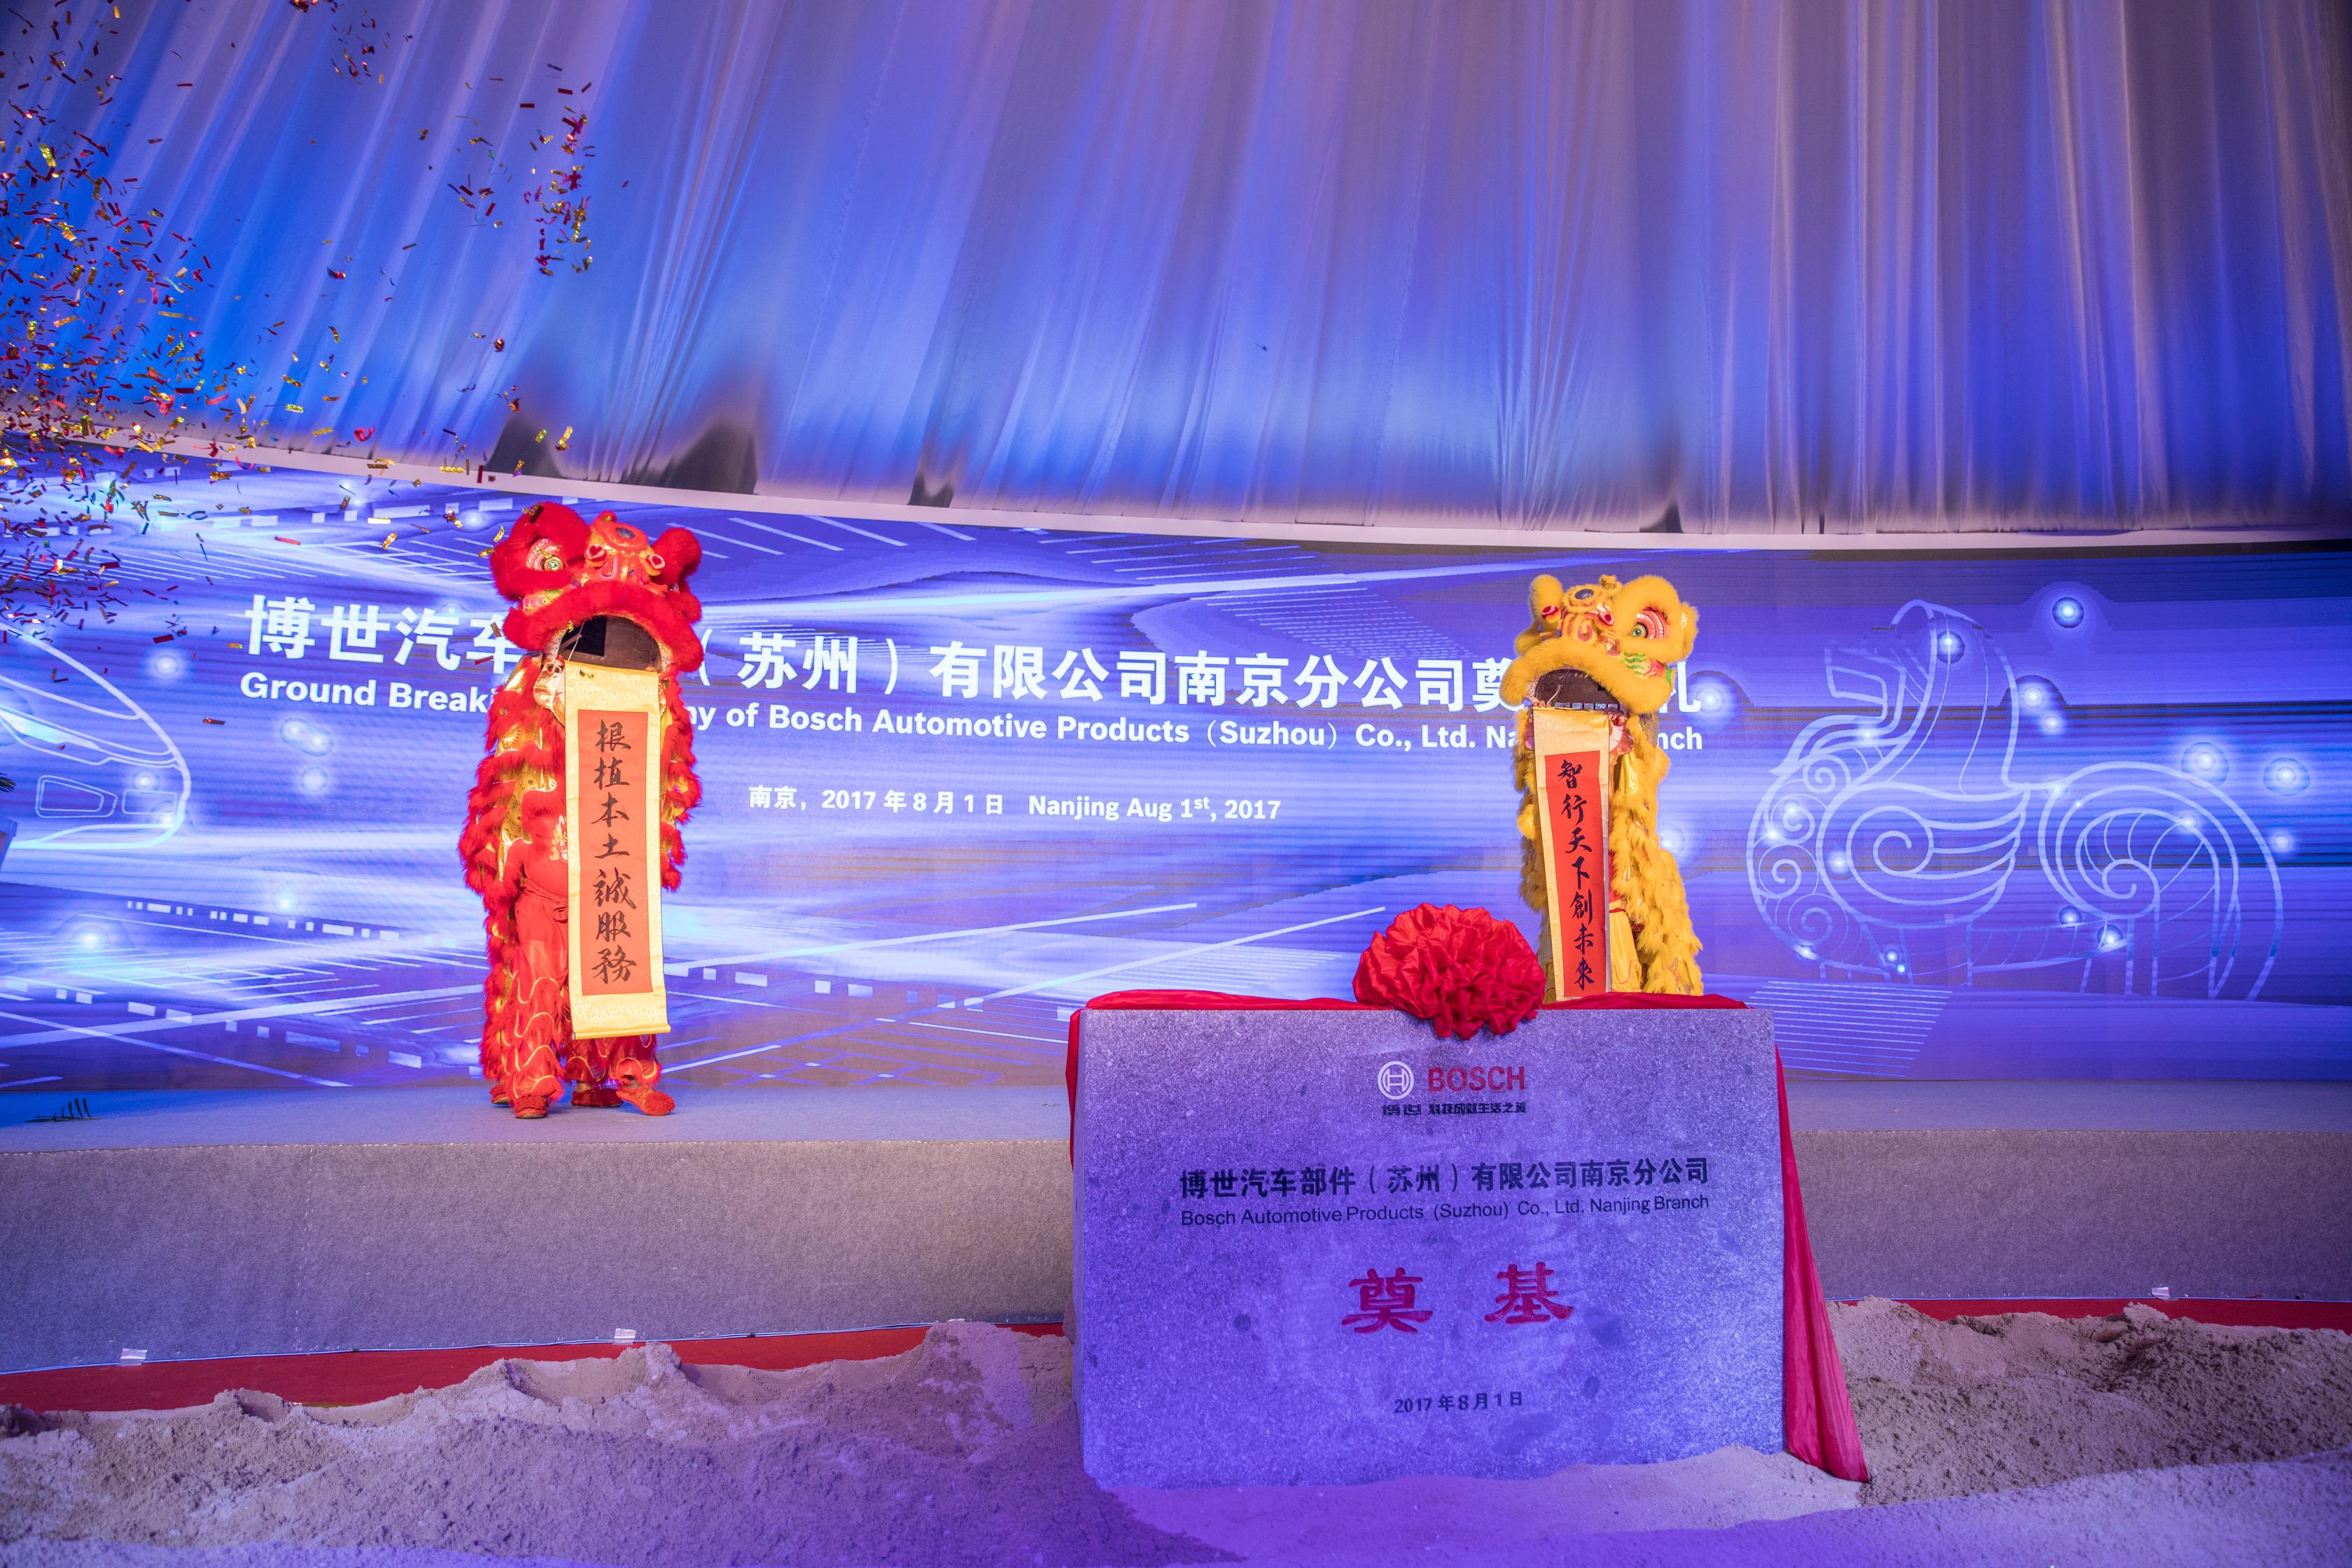 Neues Werk für iBooster in Nanjing